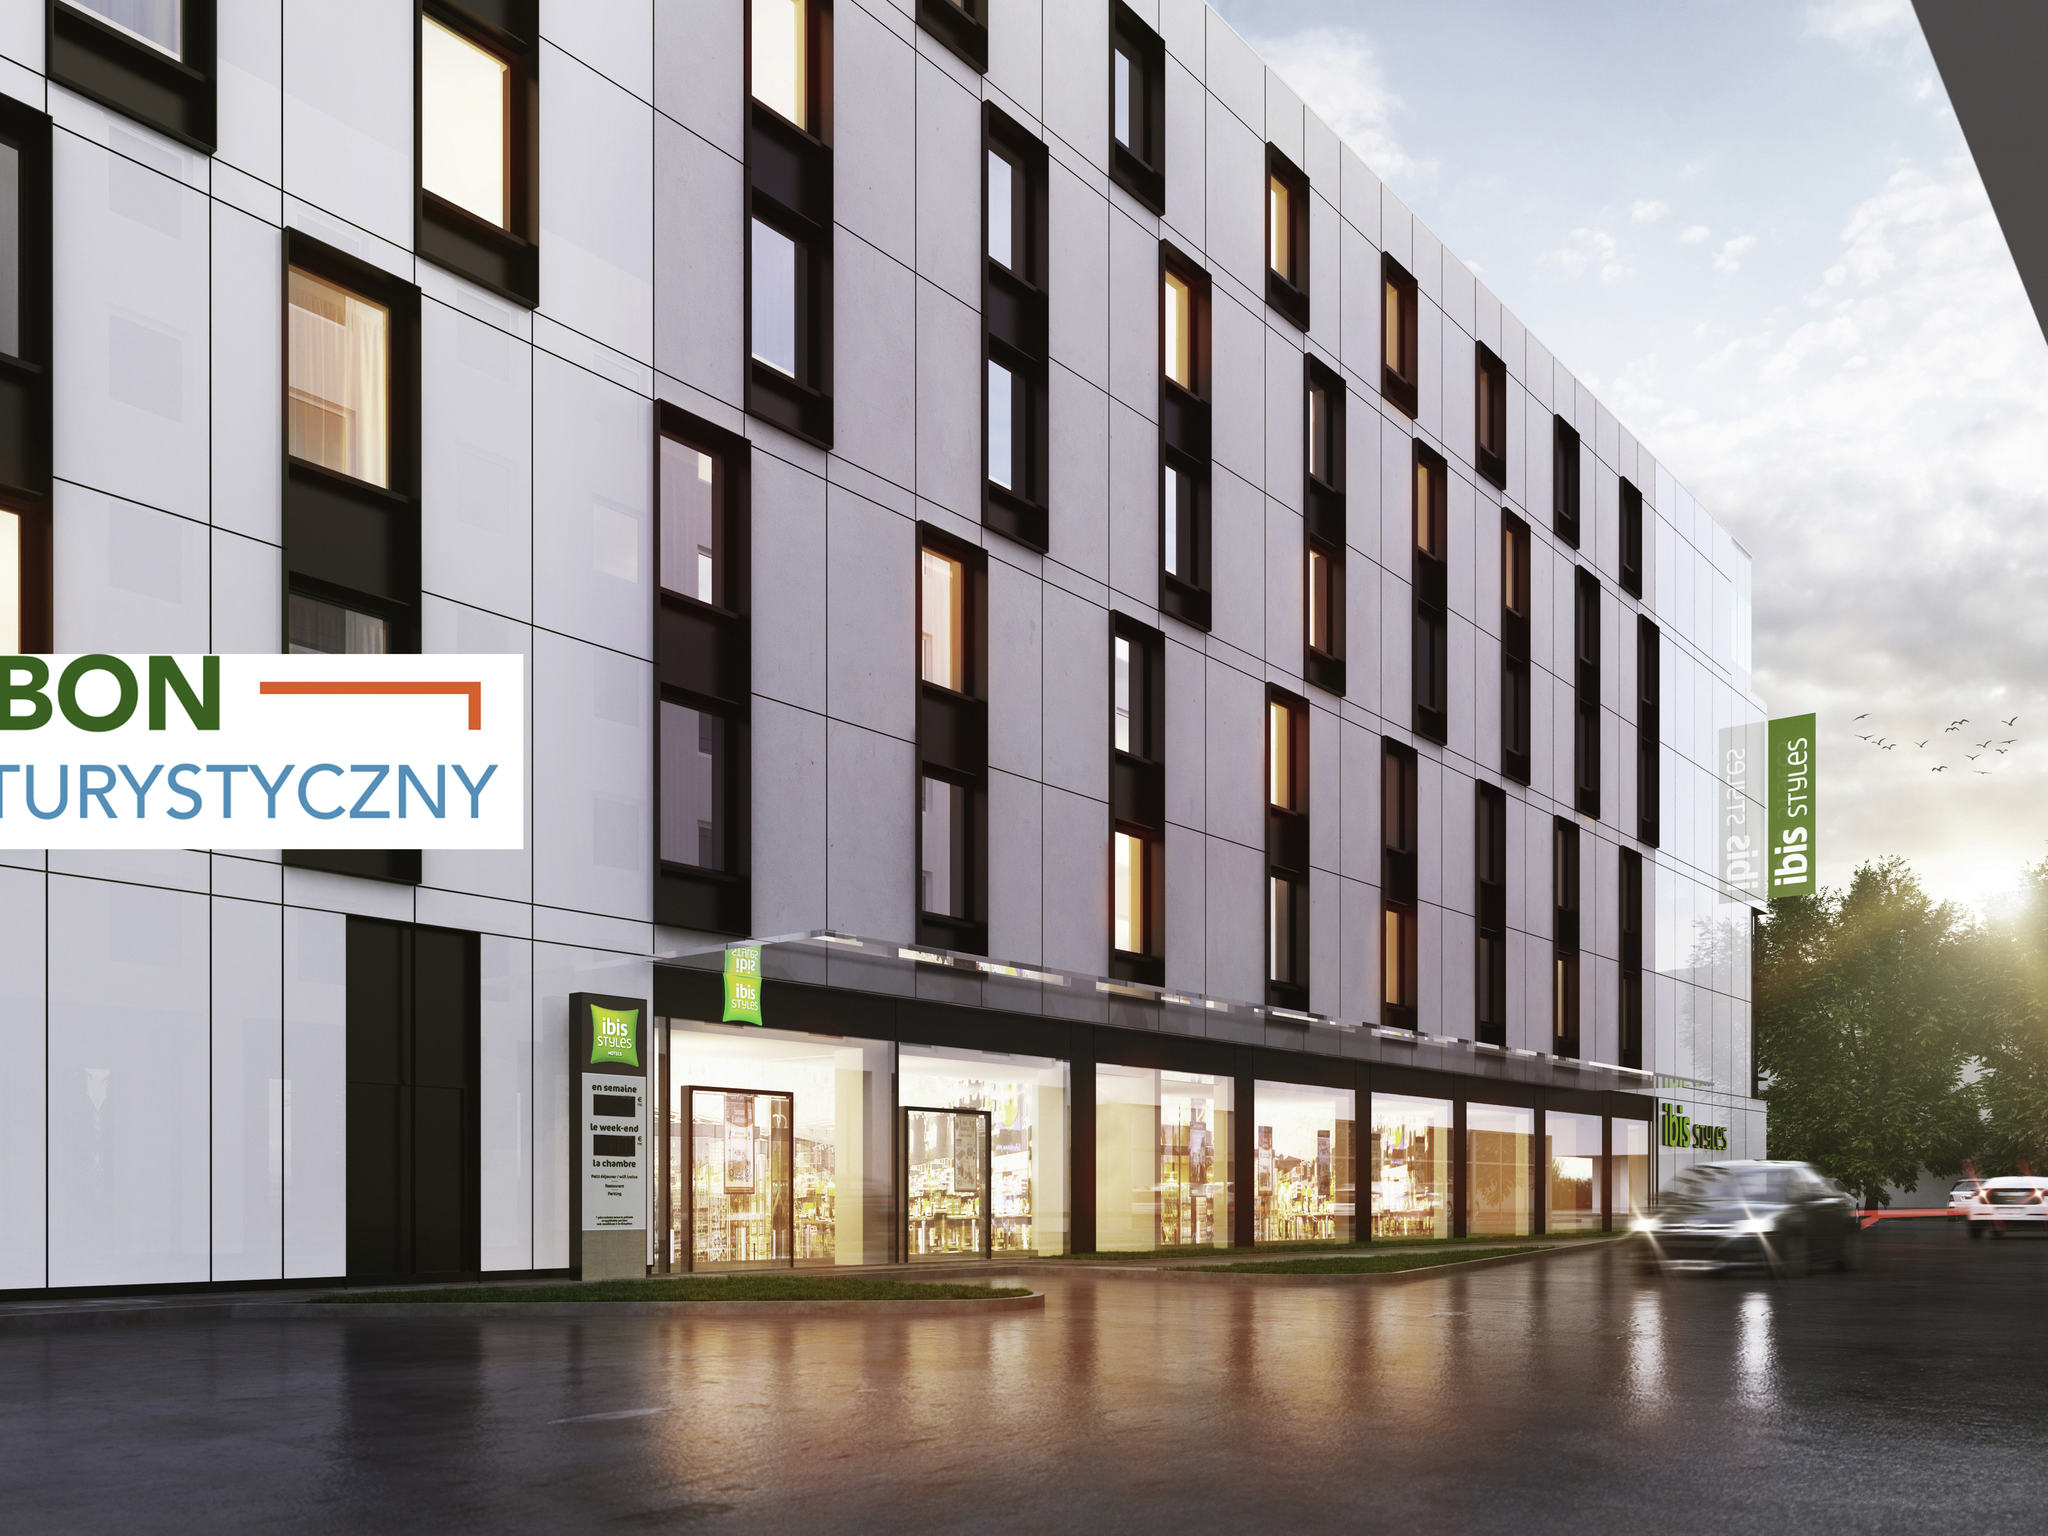 Hotel – ibis Styles Warszawa Centrum (apertura novembre 2018)